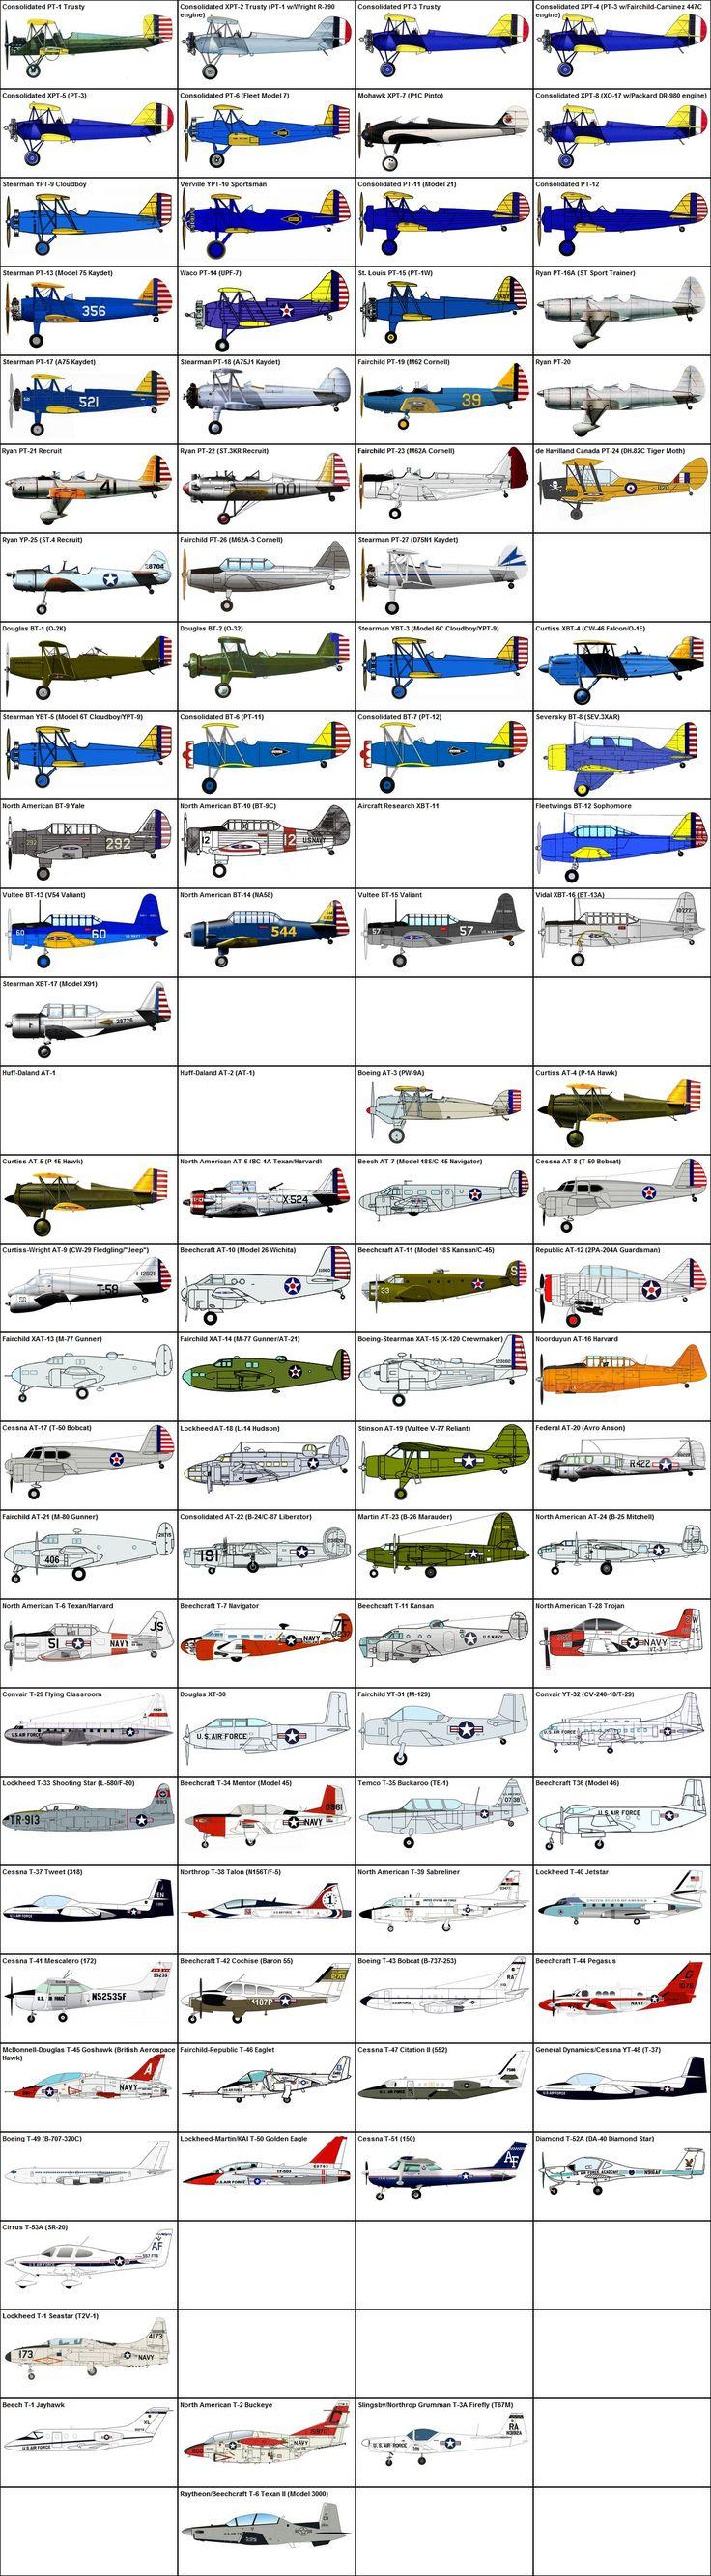 Training Aircraft